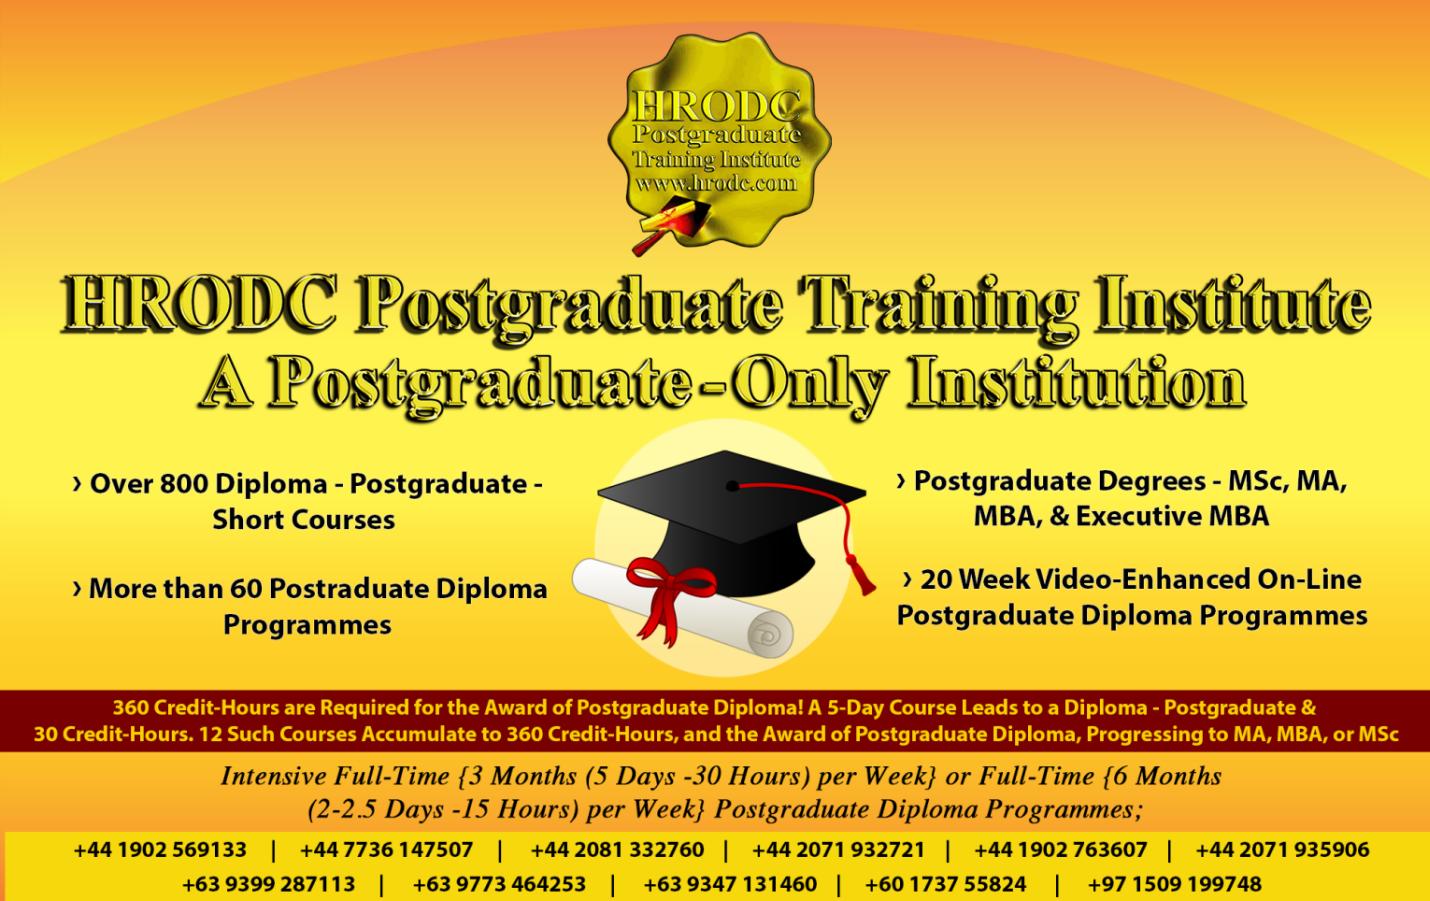 Human Resource and Organisational Development Consultancy (HRODC) LTD